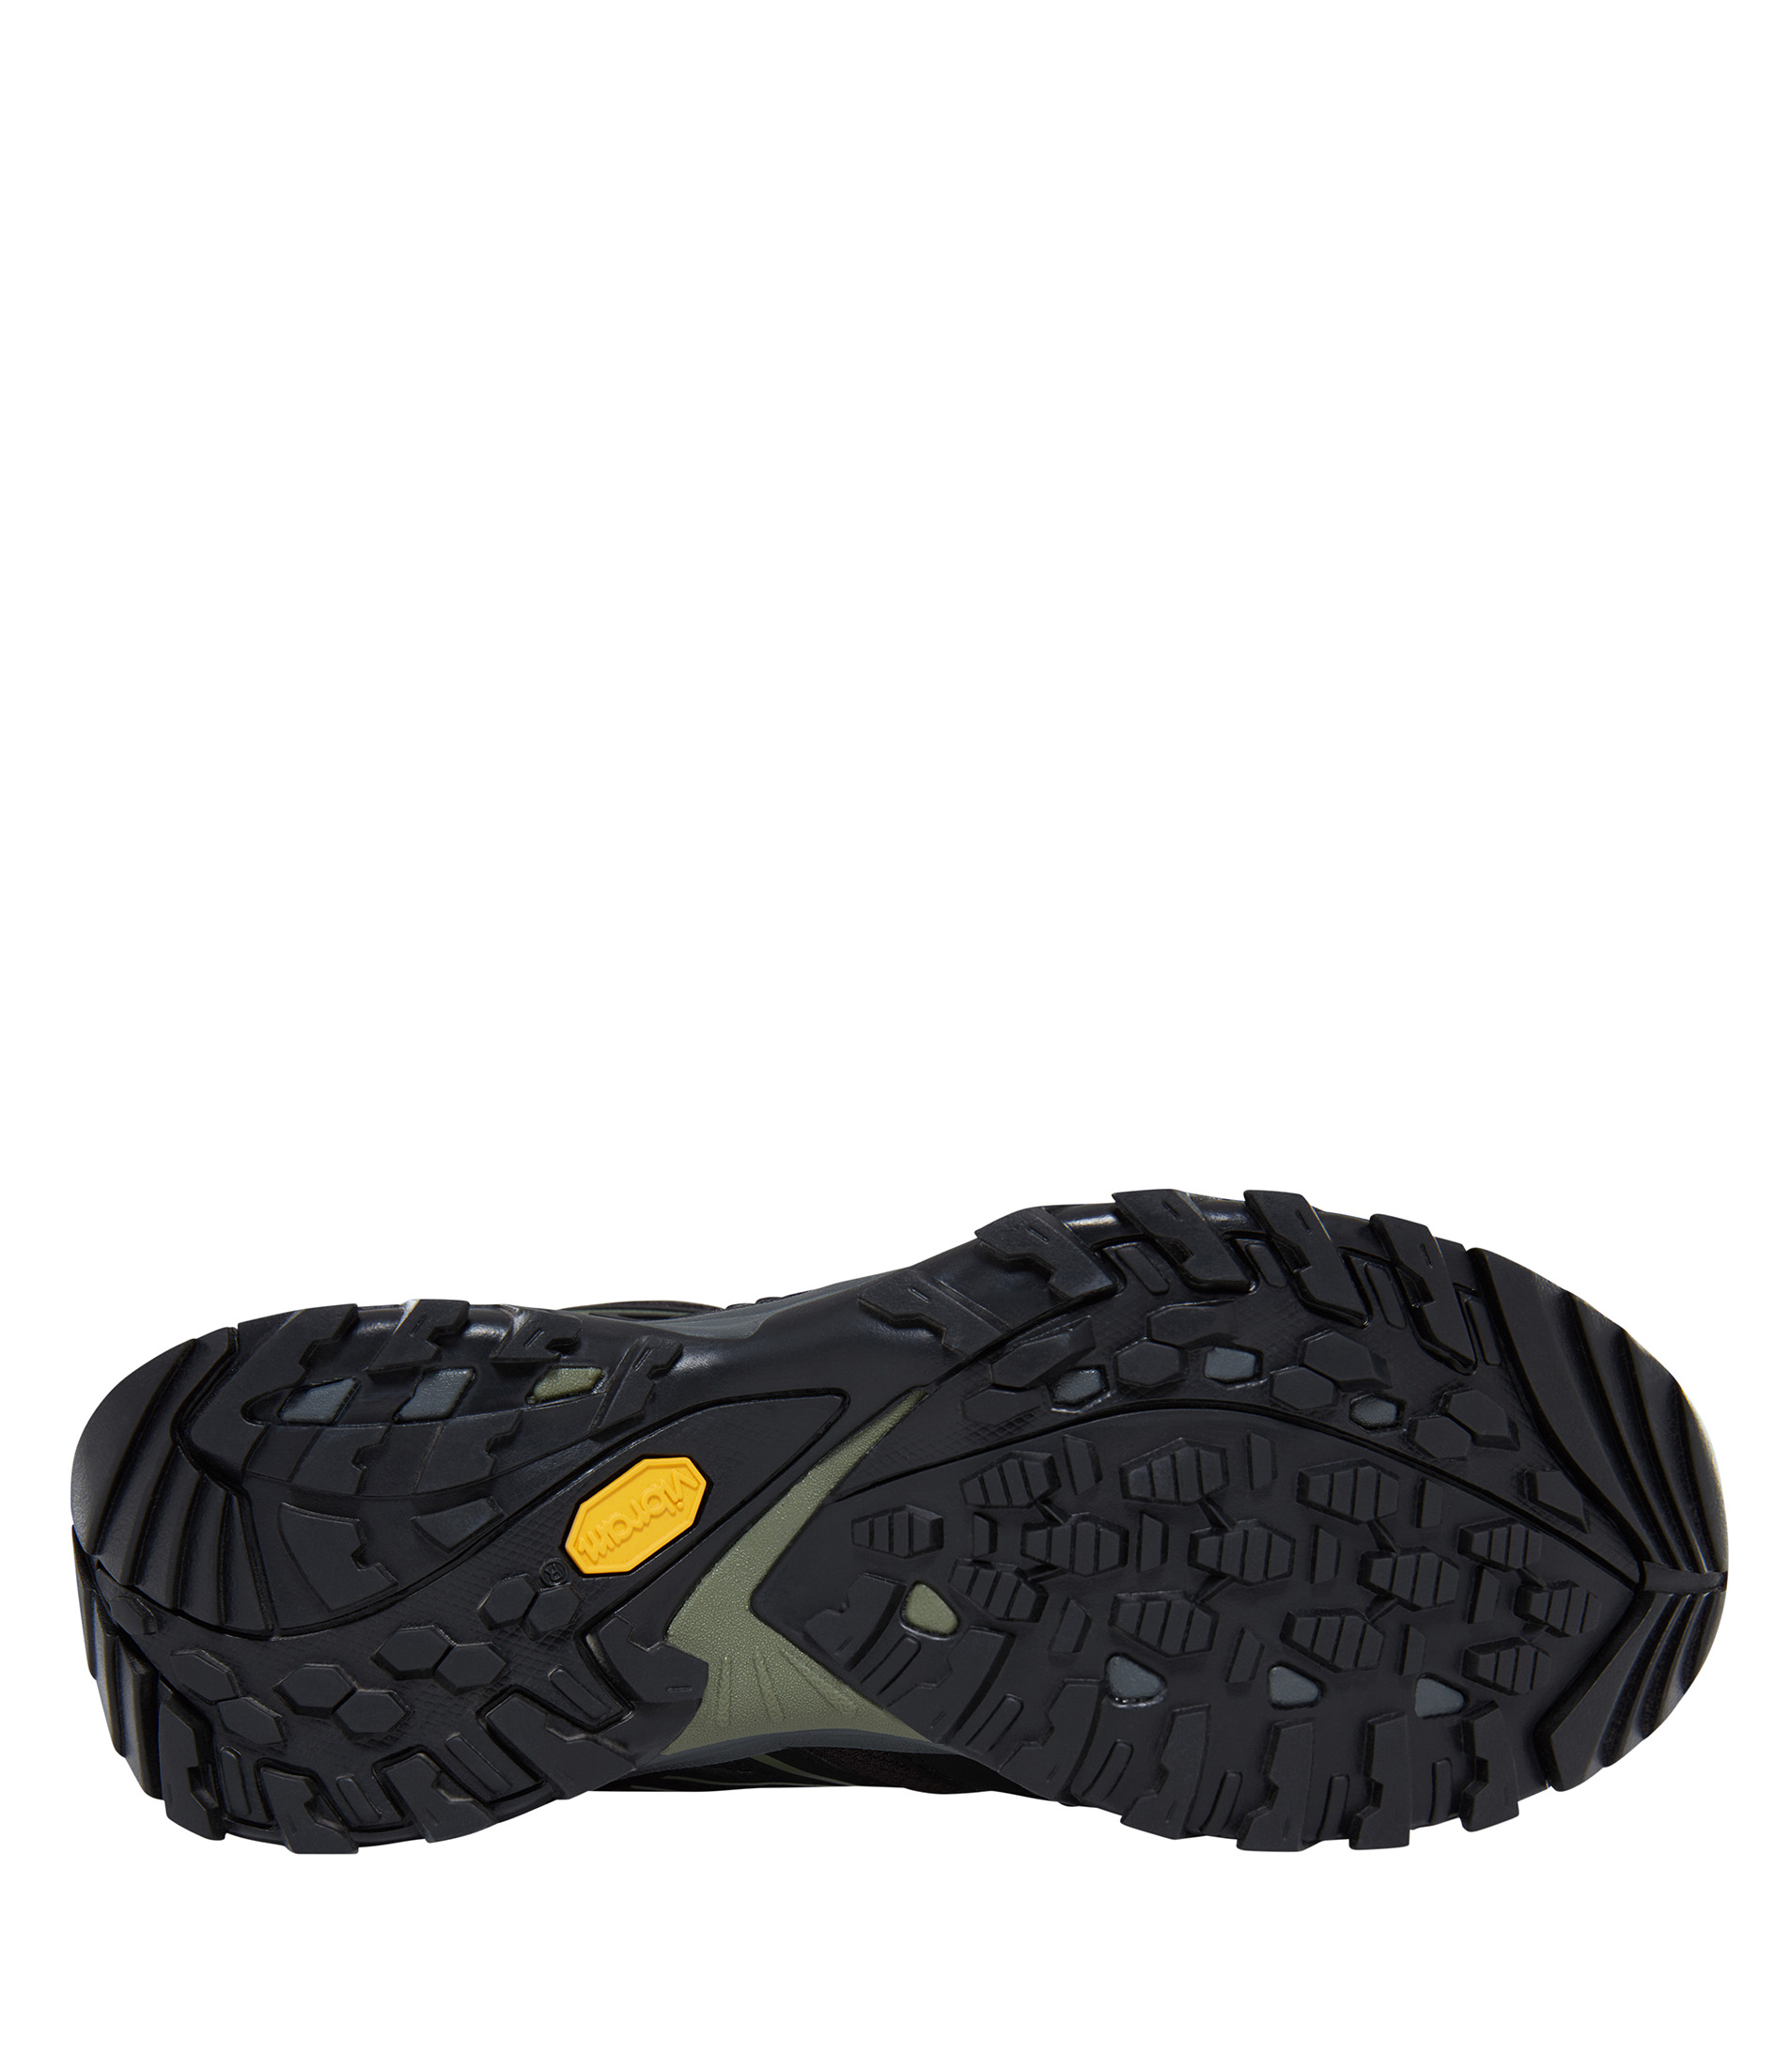 43b566a1975 Мъжки обувки M HEDGEHOG FP GTX EU. Номер: T0CXT34NX The North Face